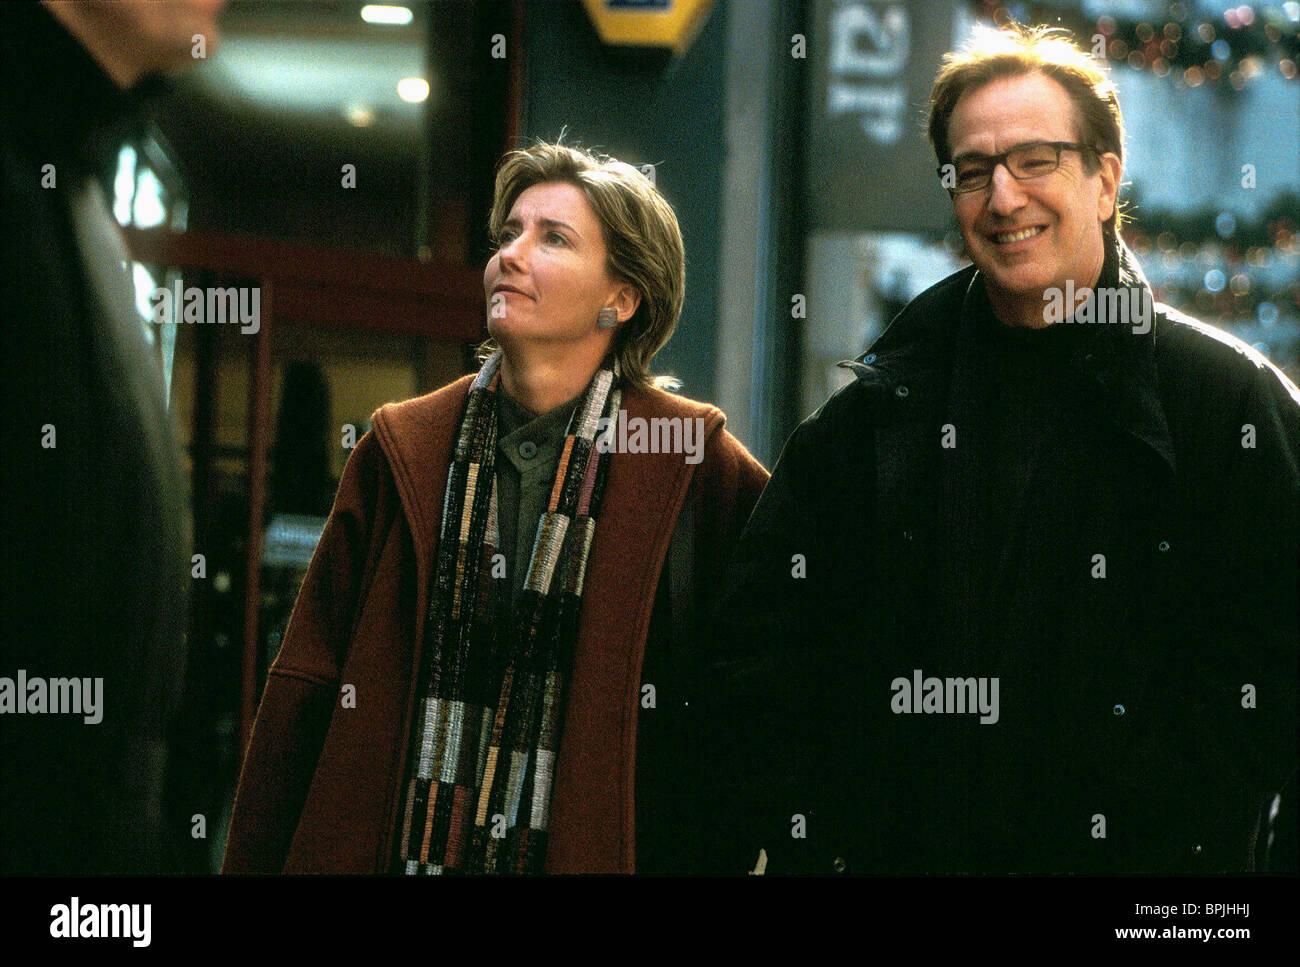 EMMA THOMPSON & ALAN RICKMAN LOVE ACTUALLY (2003) - Stock Image